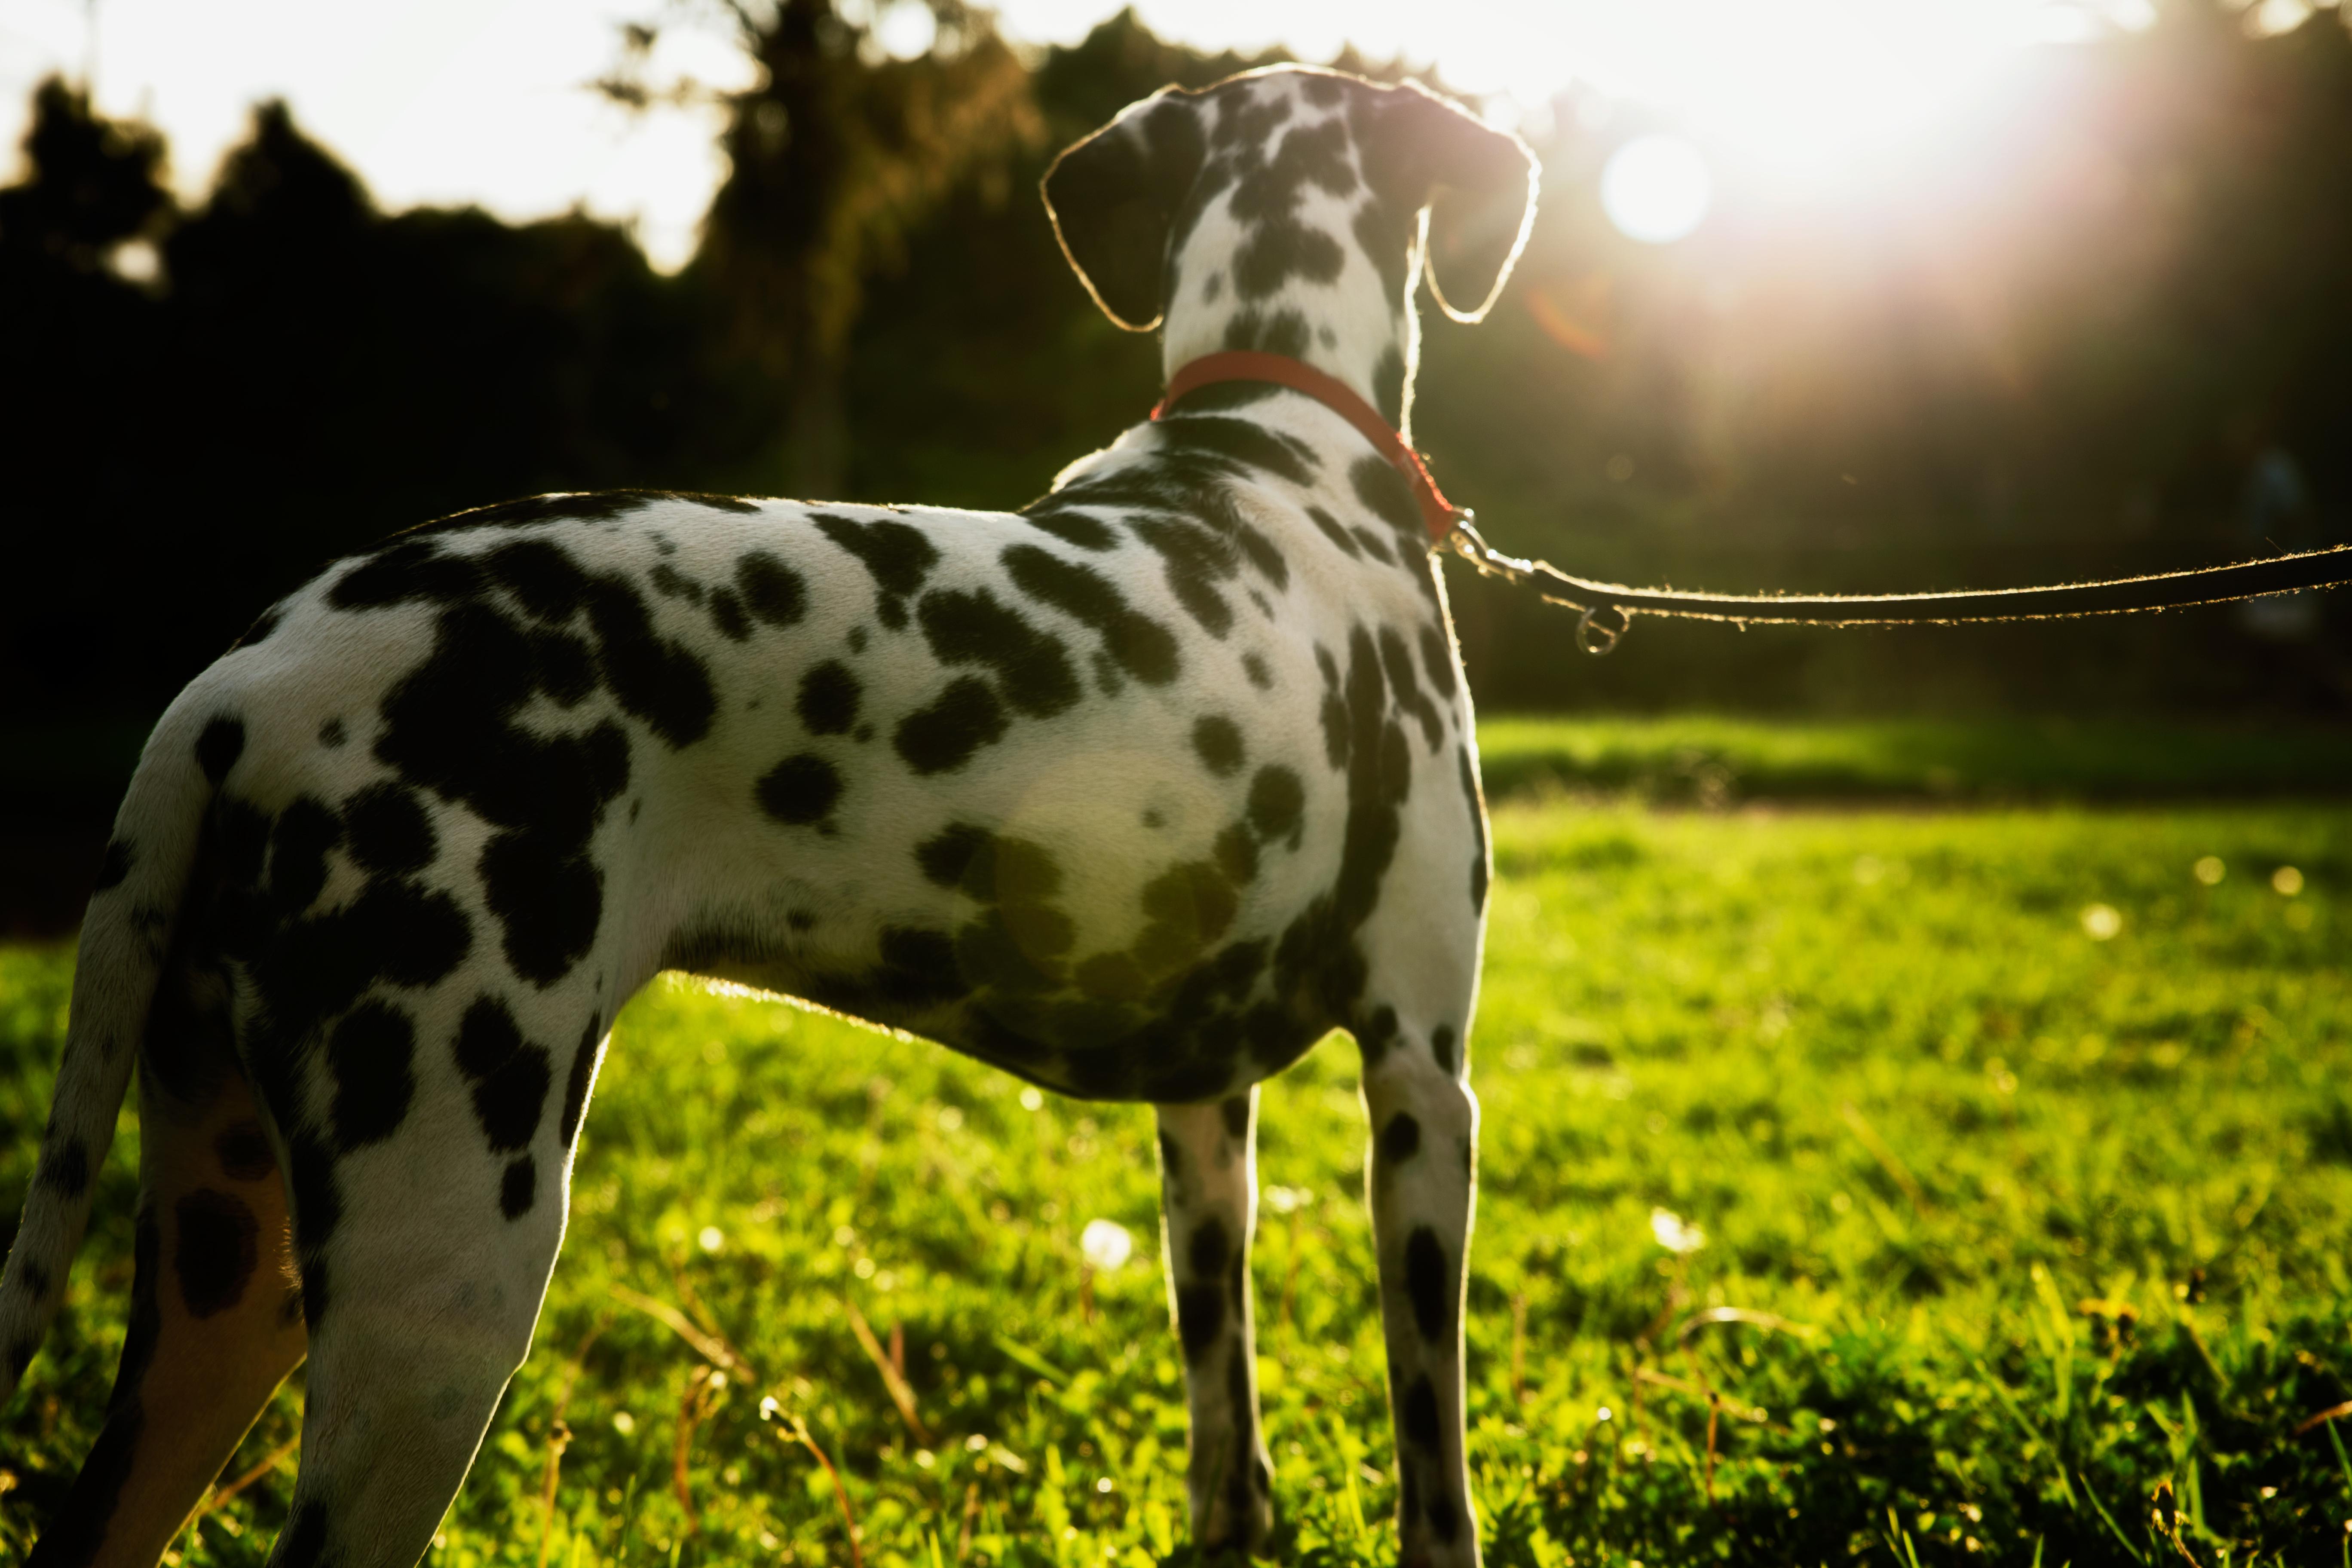 Thr dog and the sun